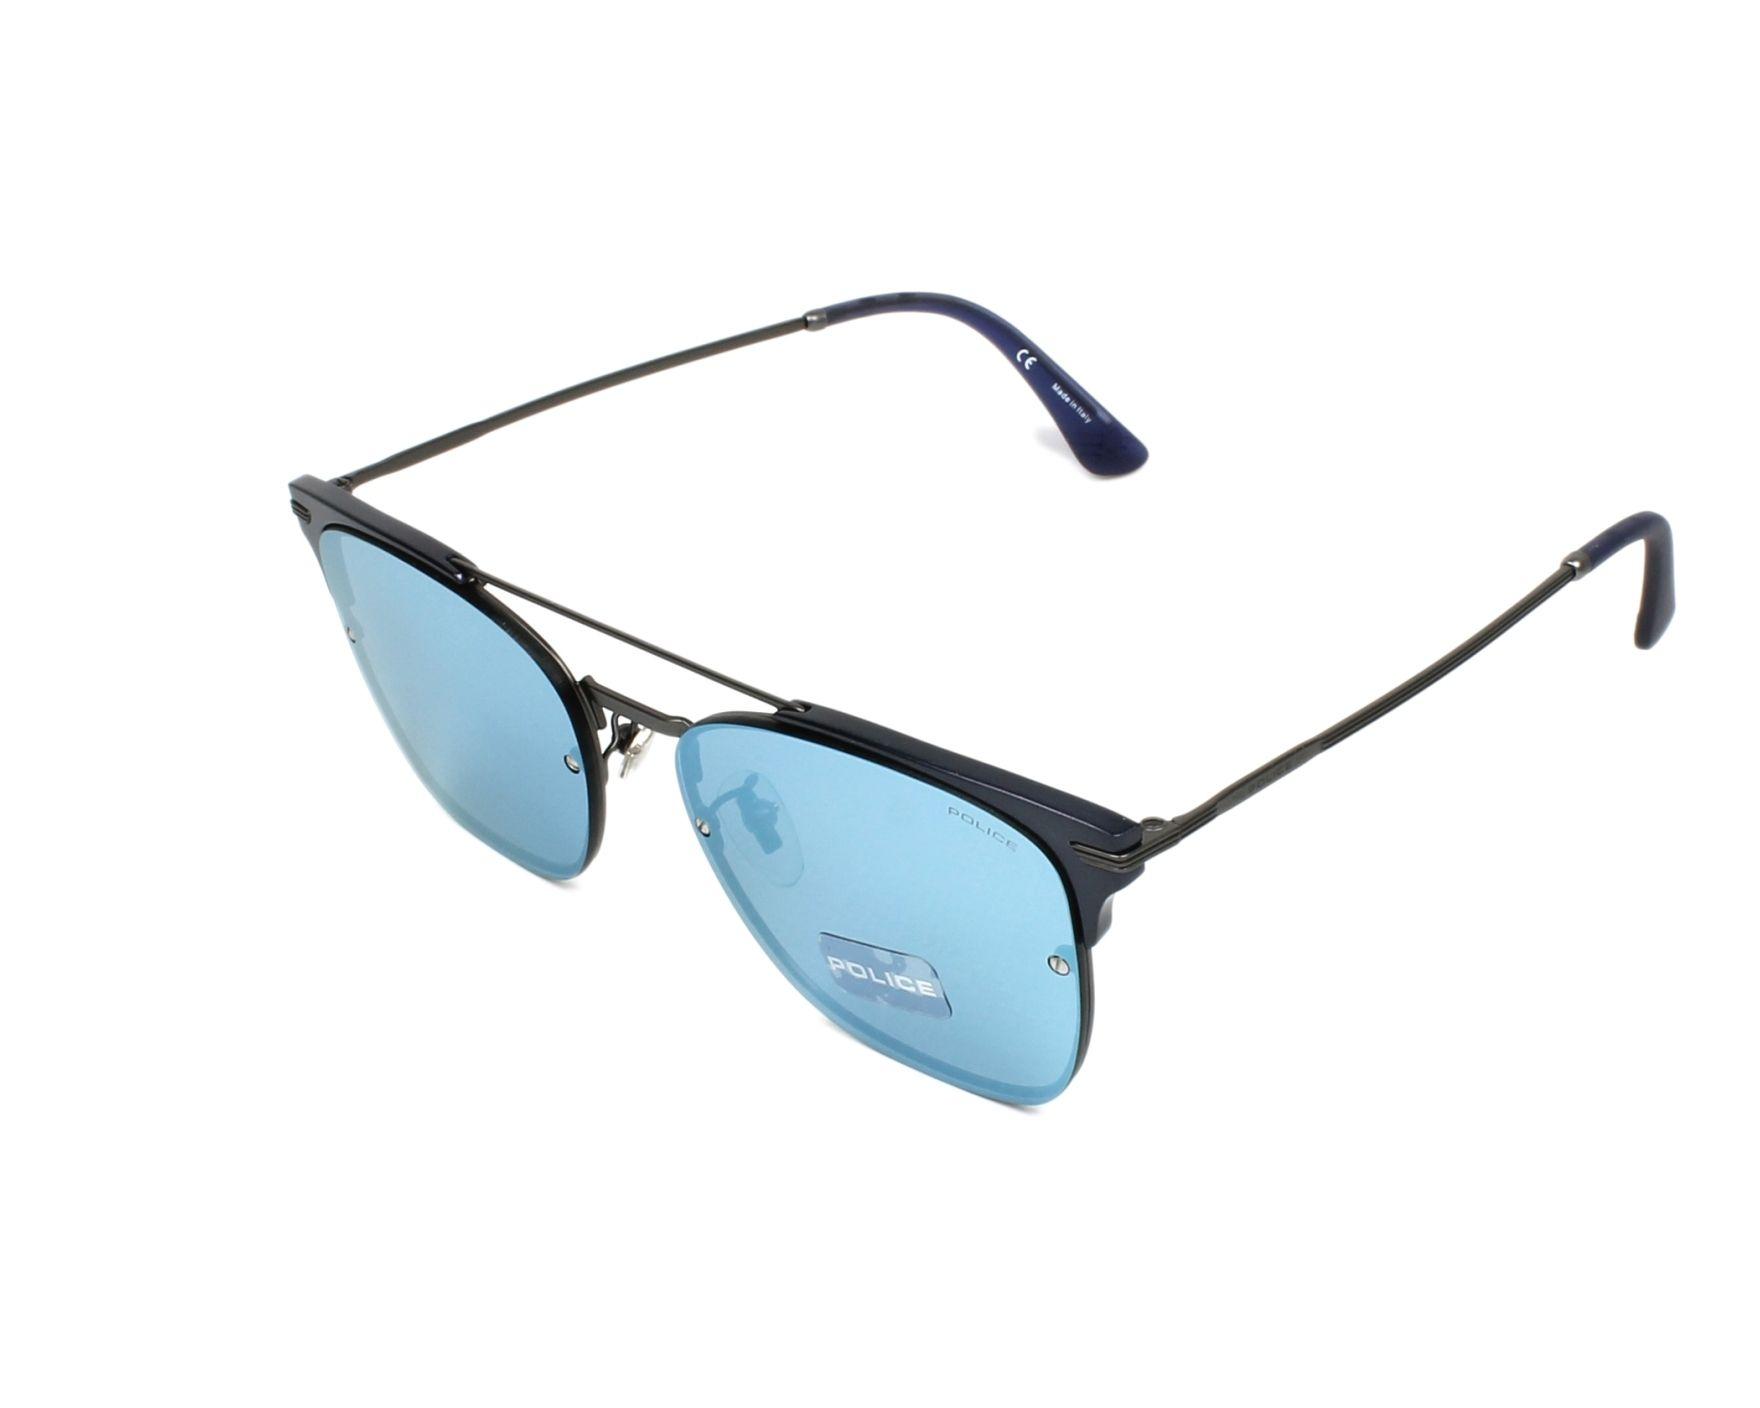 5a01b074699 thumbnail Sunglasses Police SPL-577 627B - Gun Blue profile view